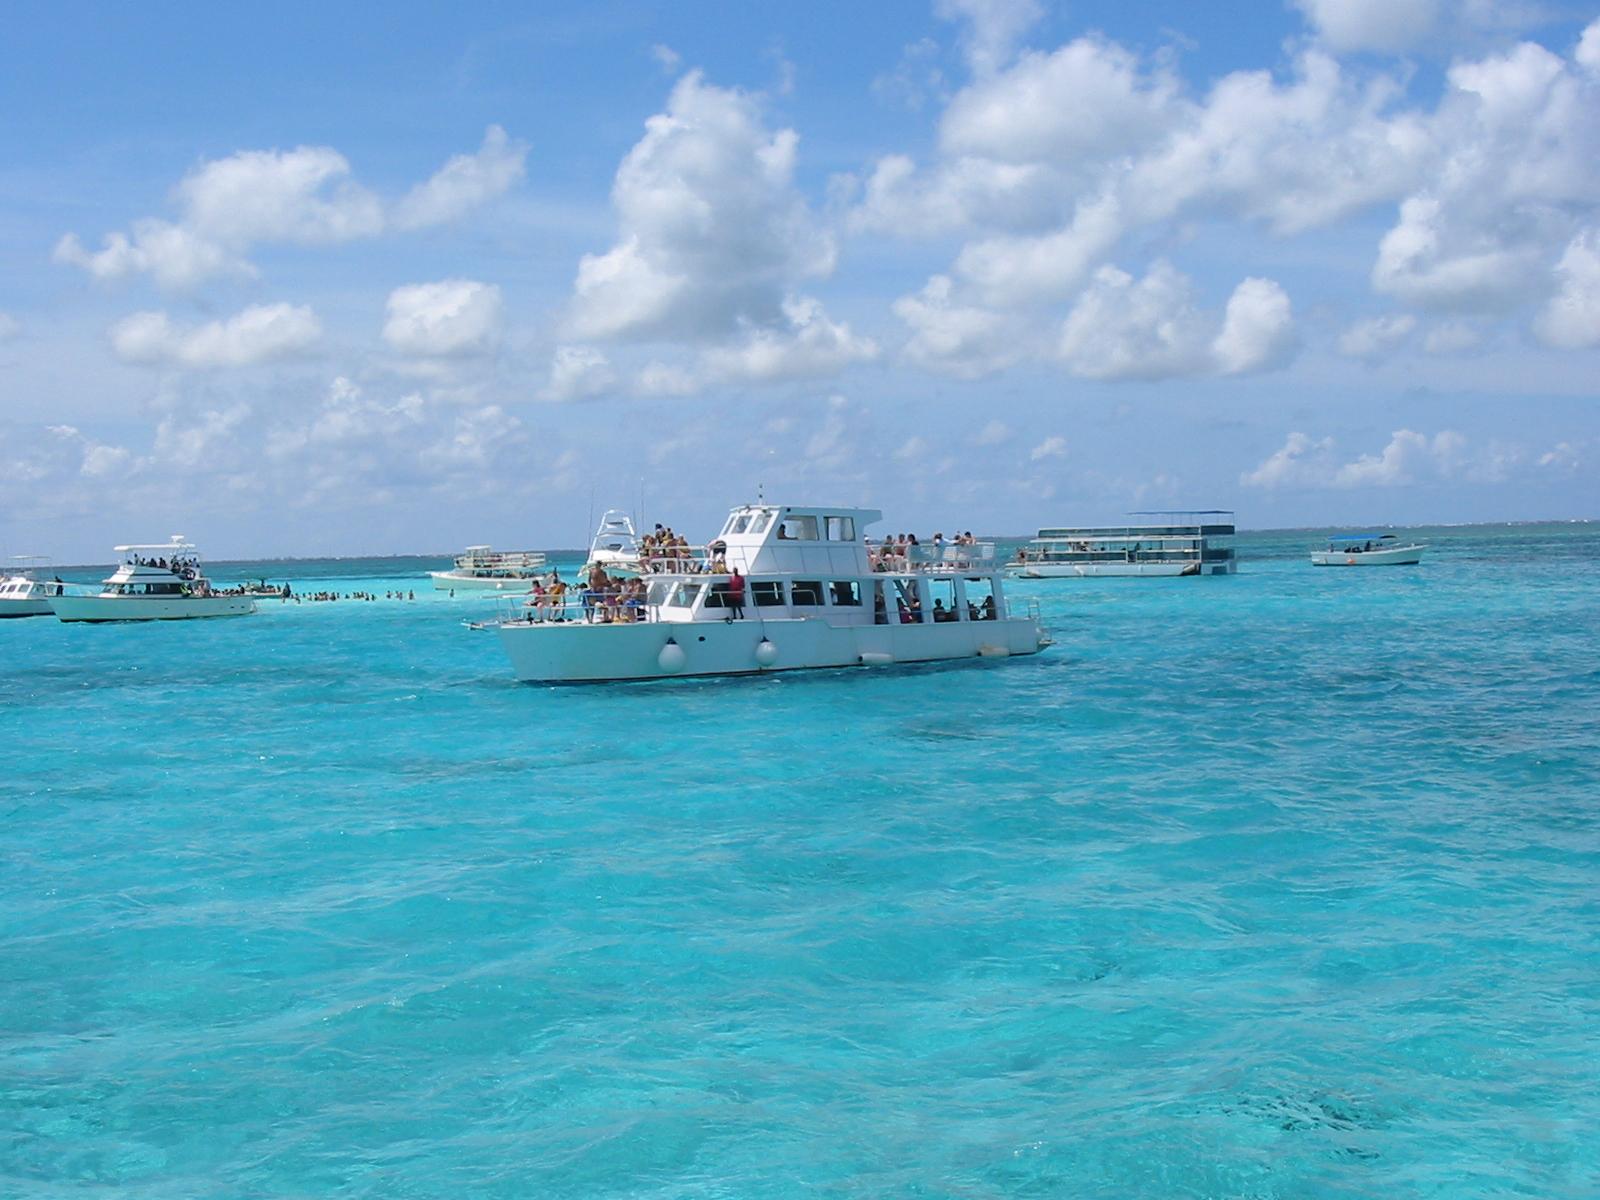 http://1.bp.blogspot.com/-IeeZnVNgztA/Tn9IWihp00I/AAAAAAAAG28/knIkdkpQa7A/s1600/Snorkeling_Cayman_Islands.jpg